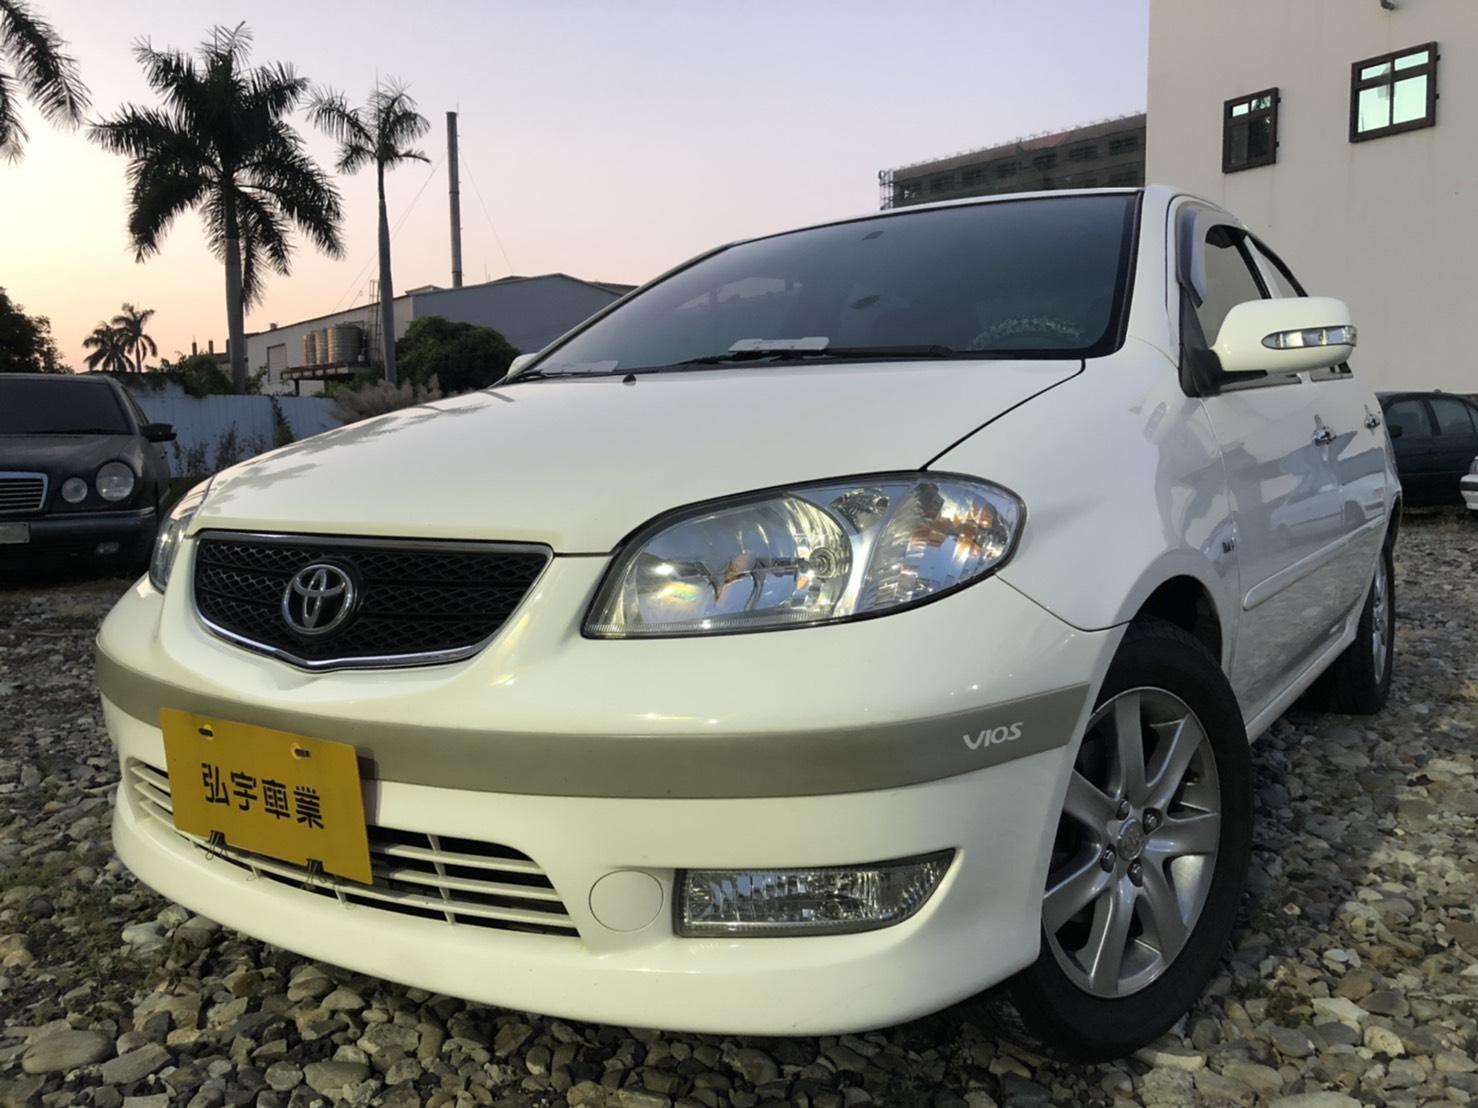 2005 Toyota 豐田 Vios